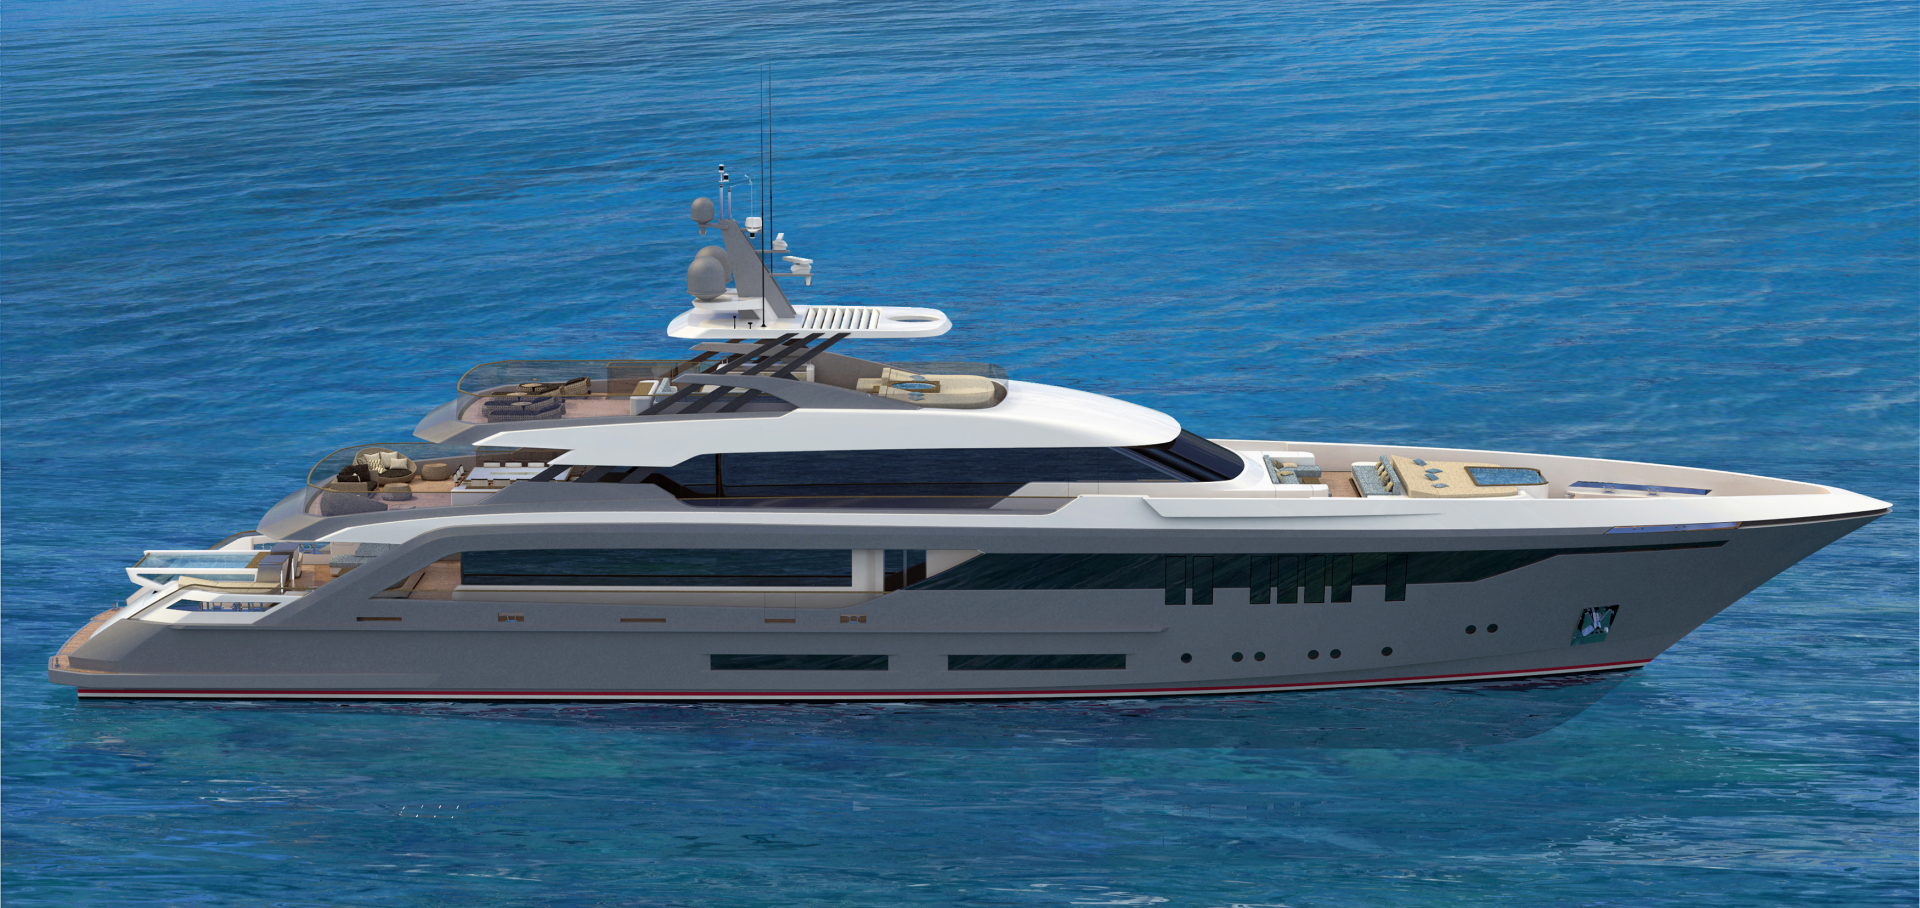 GHI Yachts 2023-THUNDERBIRD 165 Korea, Republic of-1337229 | Thumbnail